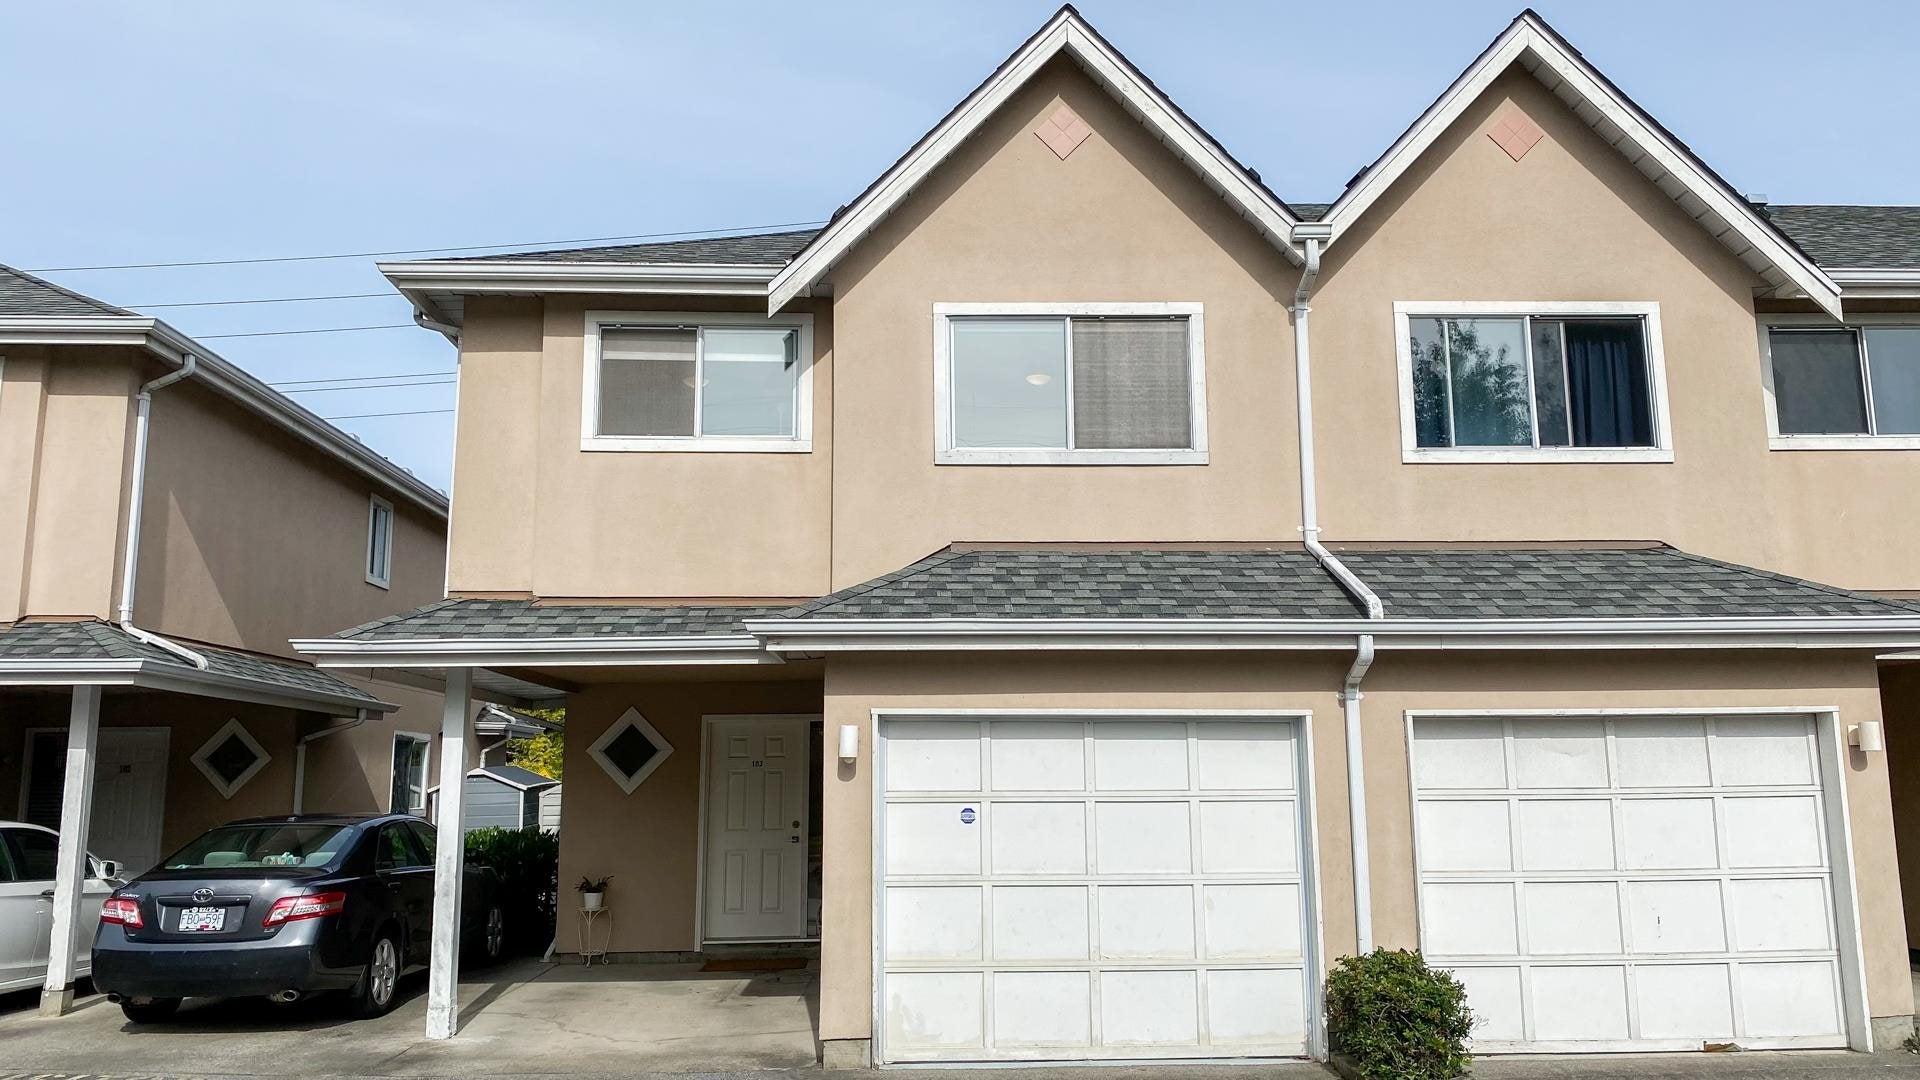 103 2211 NO. 4 ROAD - Bridgeport RI Townhouse for sale, 3 Bedrooms (R2599291)